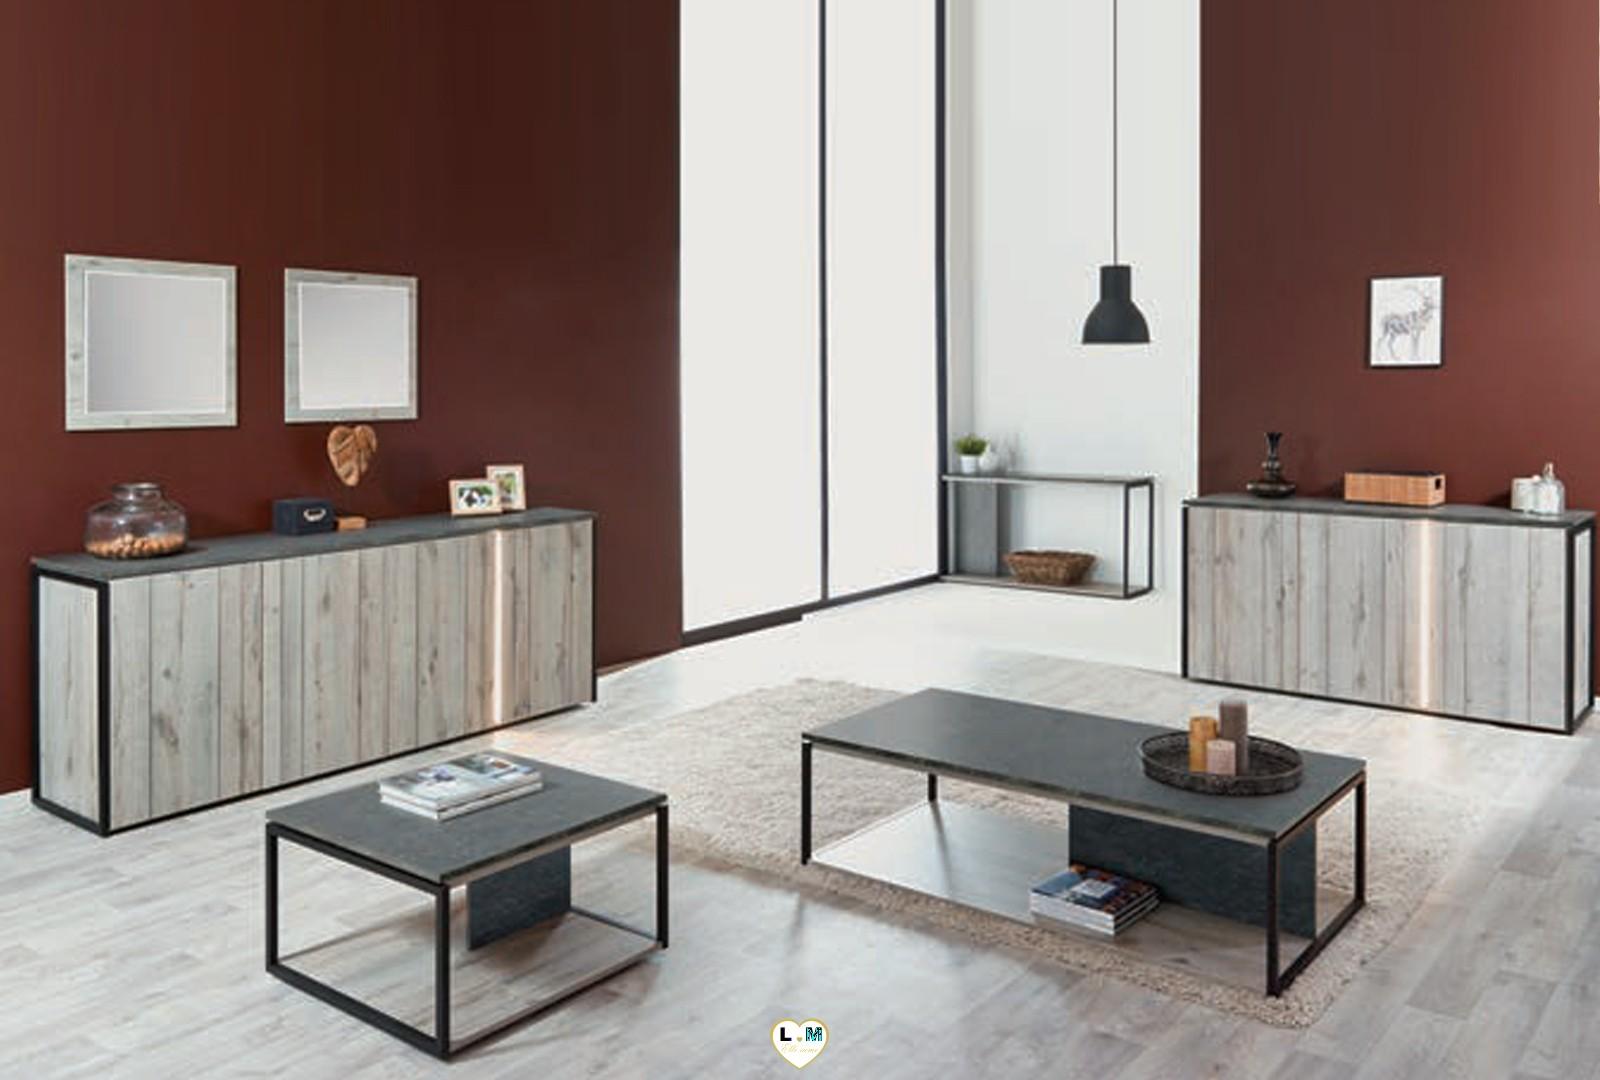 macarena bois chene excalibur ensemble sejour salle a. Black Bedroom Furniture Sets. Home Design Ideas